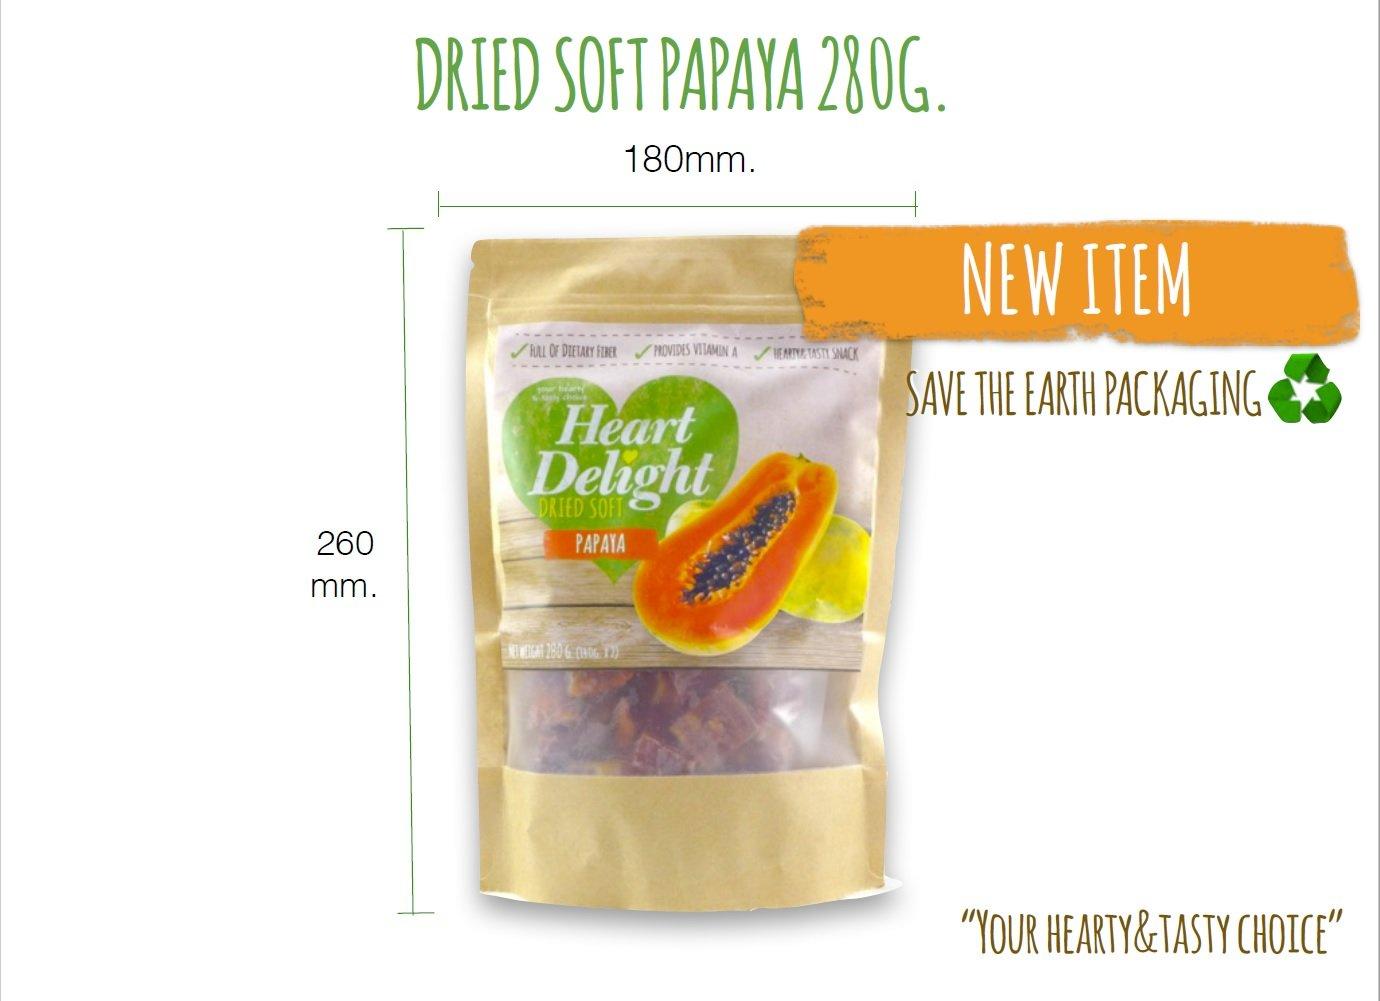 Heart DeLight Dried Soft Tasty Tropical Papaya Fruit 280 gr. - 9.87 oz.